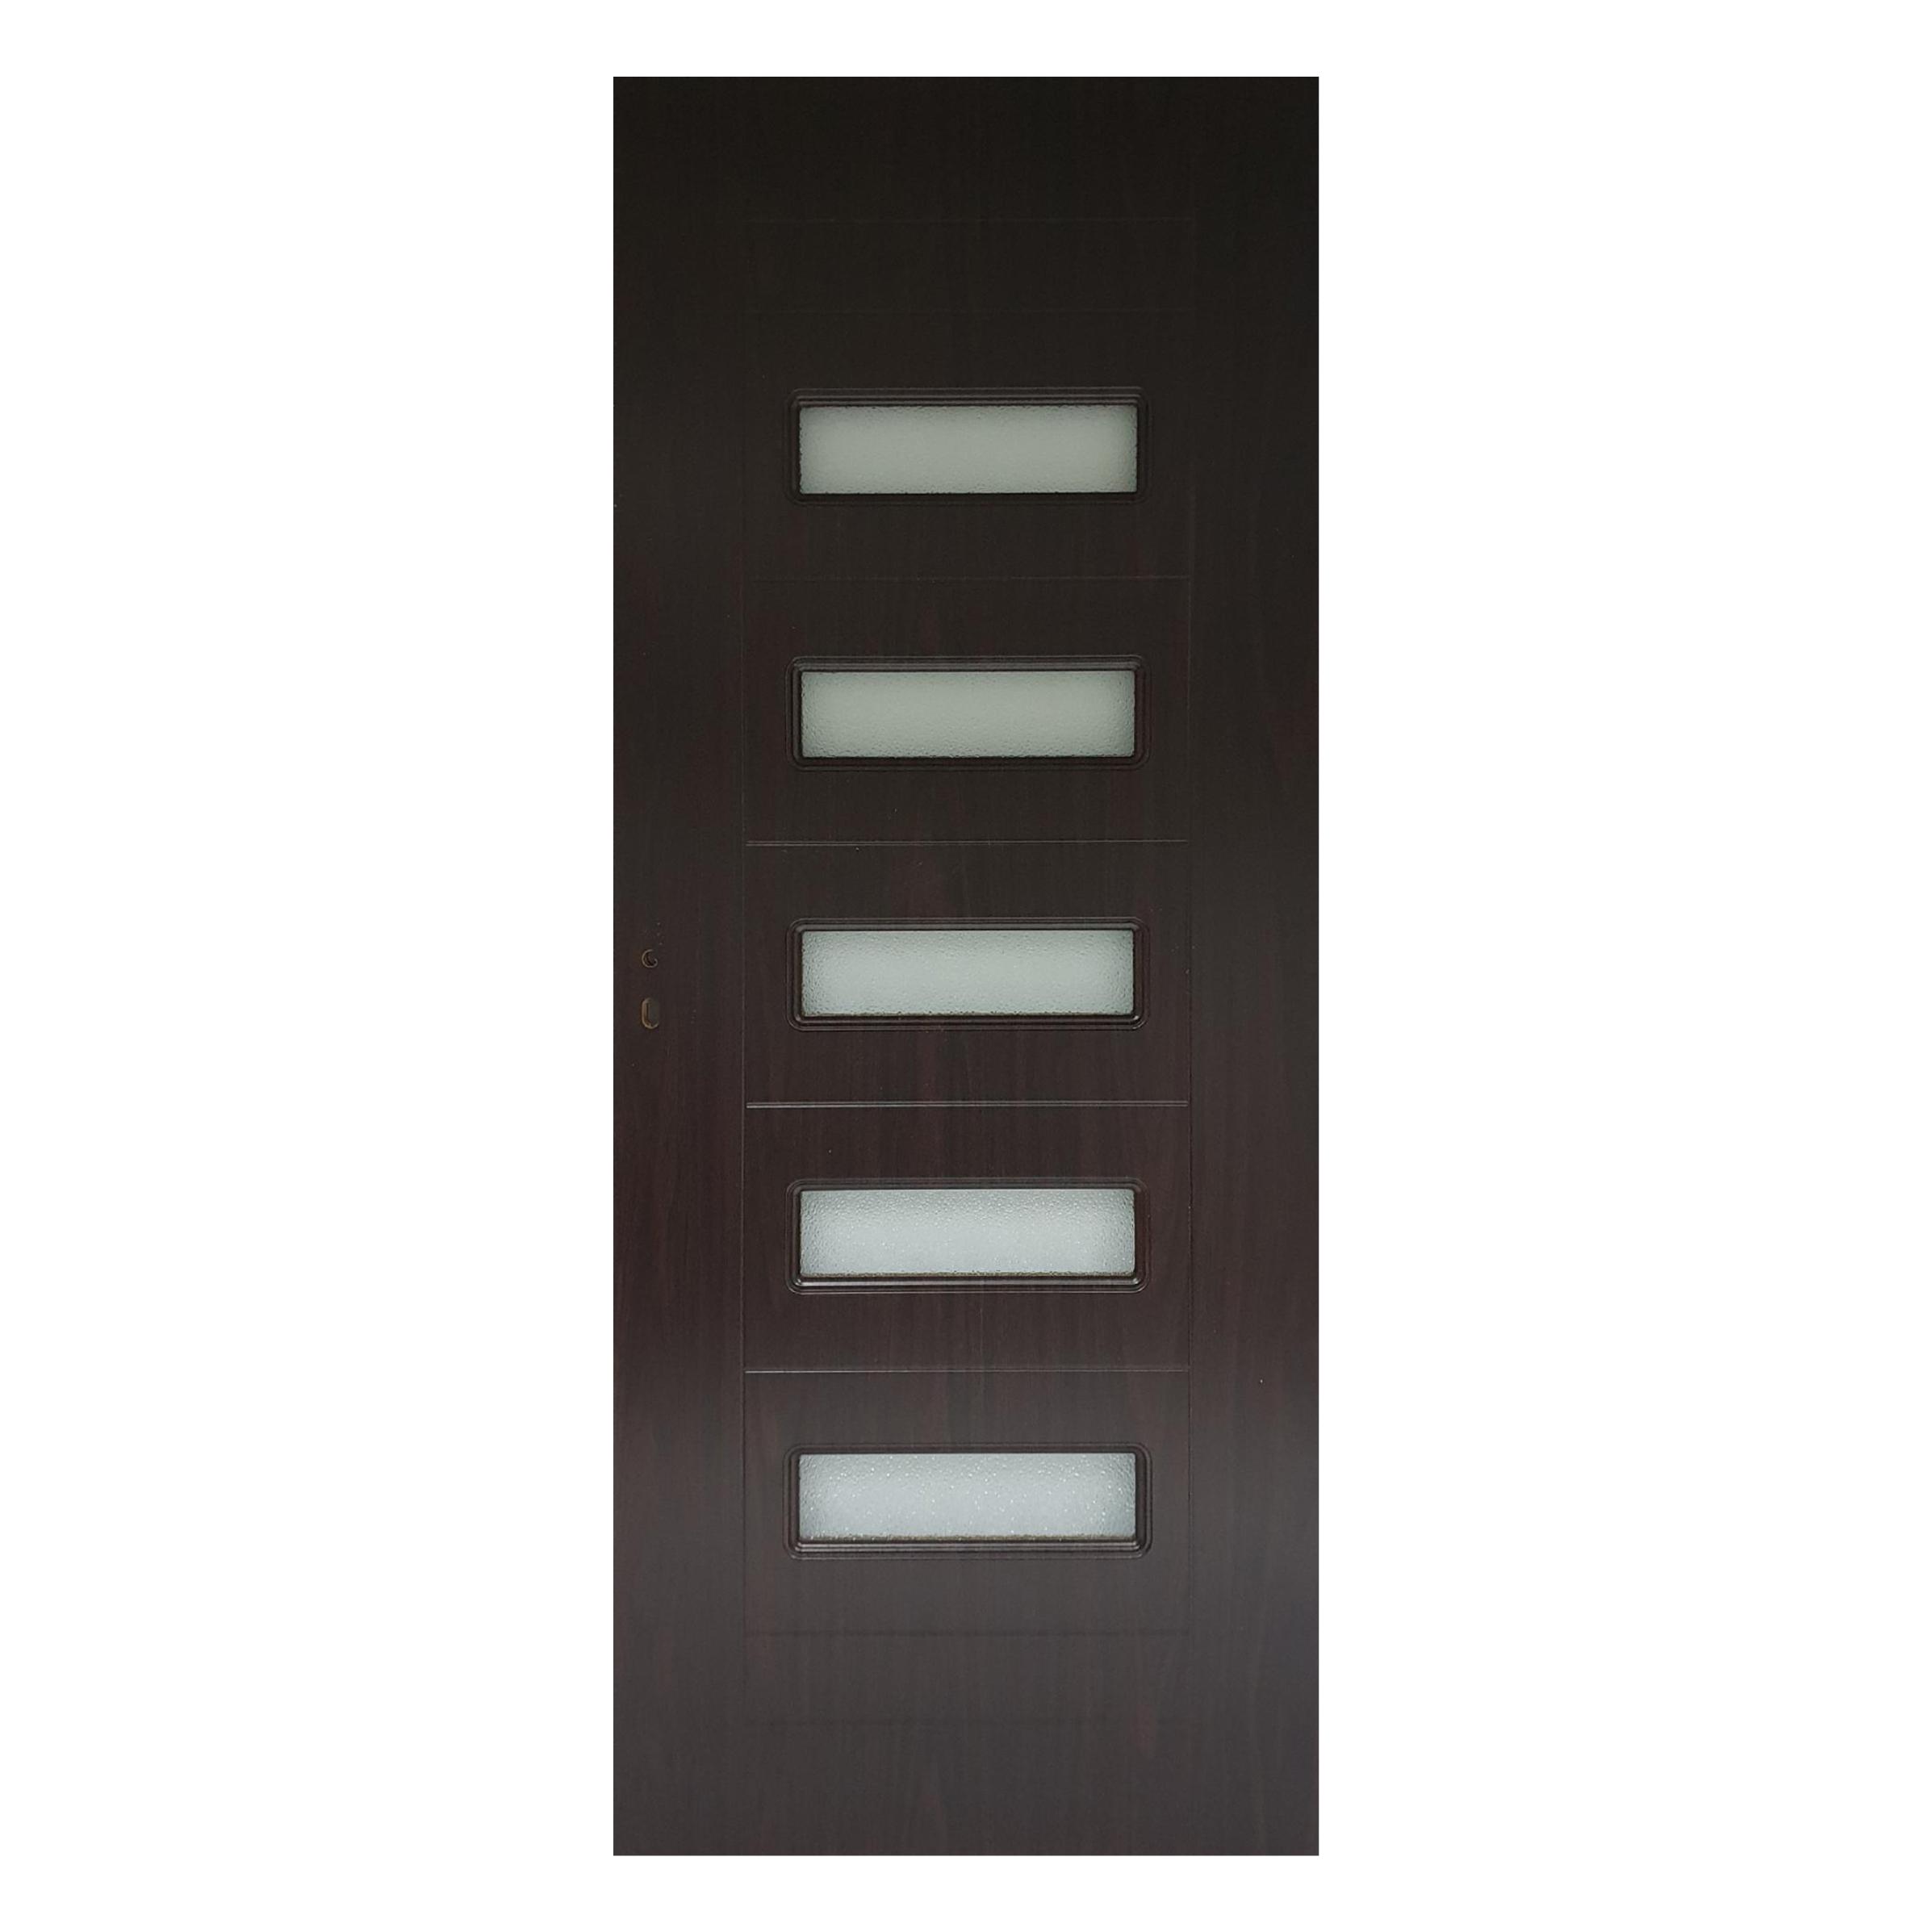 Usa interior cu geam Pamate M104, wenge, 203 x 70 x 3,5 cm + toc 10 cm, reversibila imagine 2021 mathaus